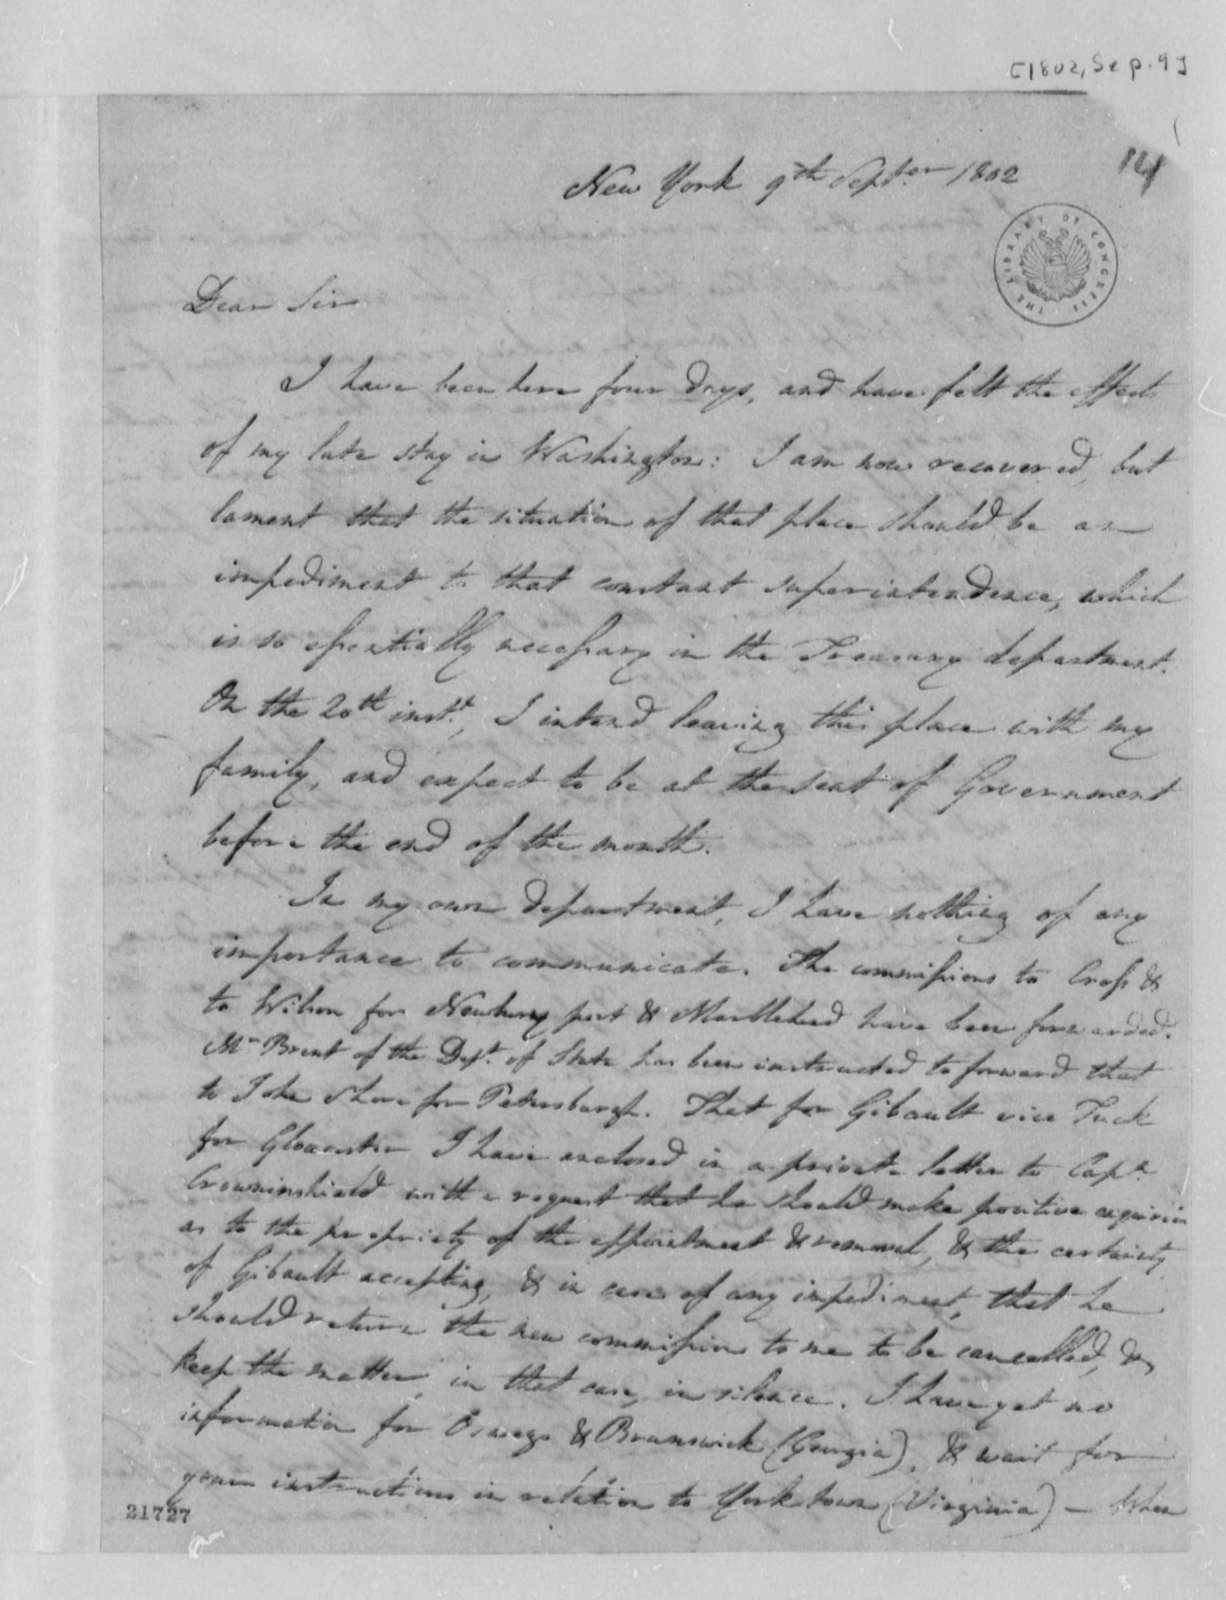 Albert Gallatin to Thomas Jefferson, September 9, 1802